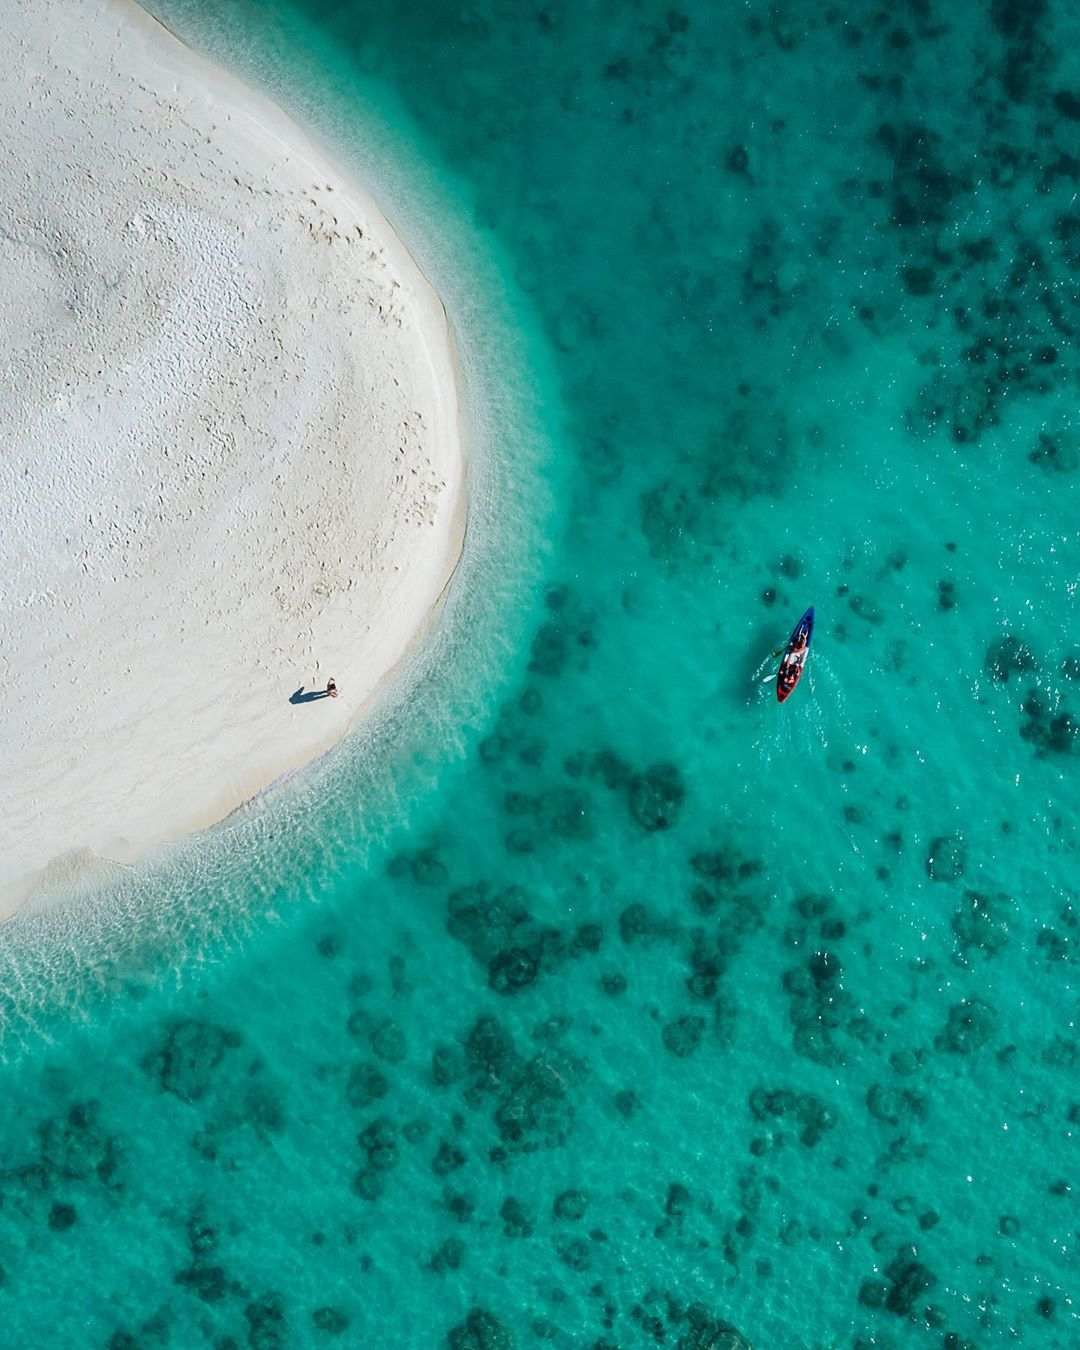 Koh Lipe zandbank gezien vanaf de drone